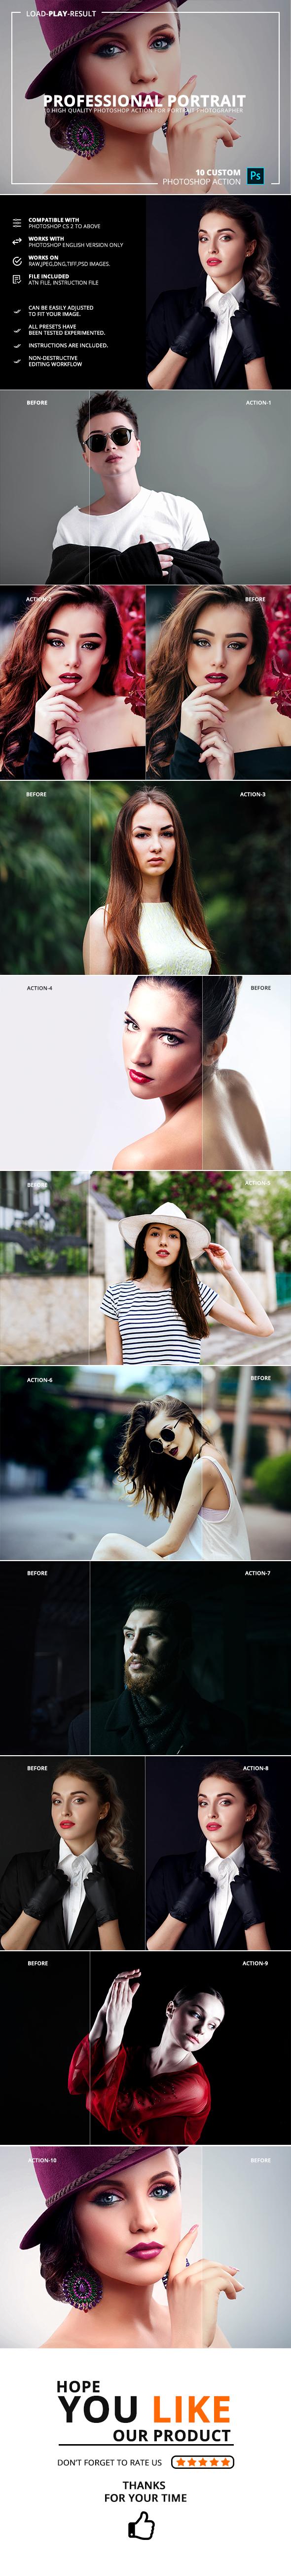 Professional Portrait Photoshop Action - Photo Effects Actions